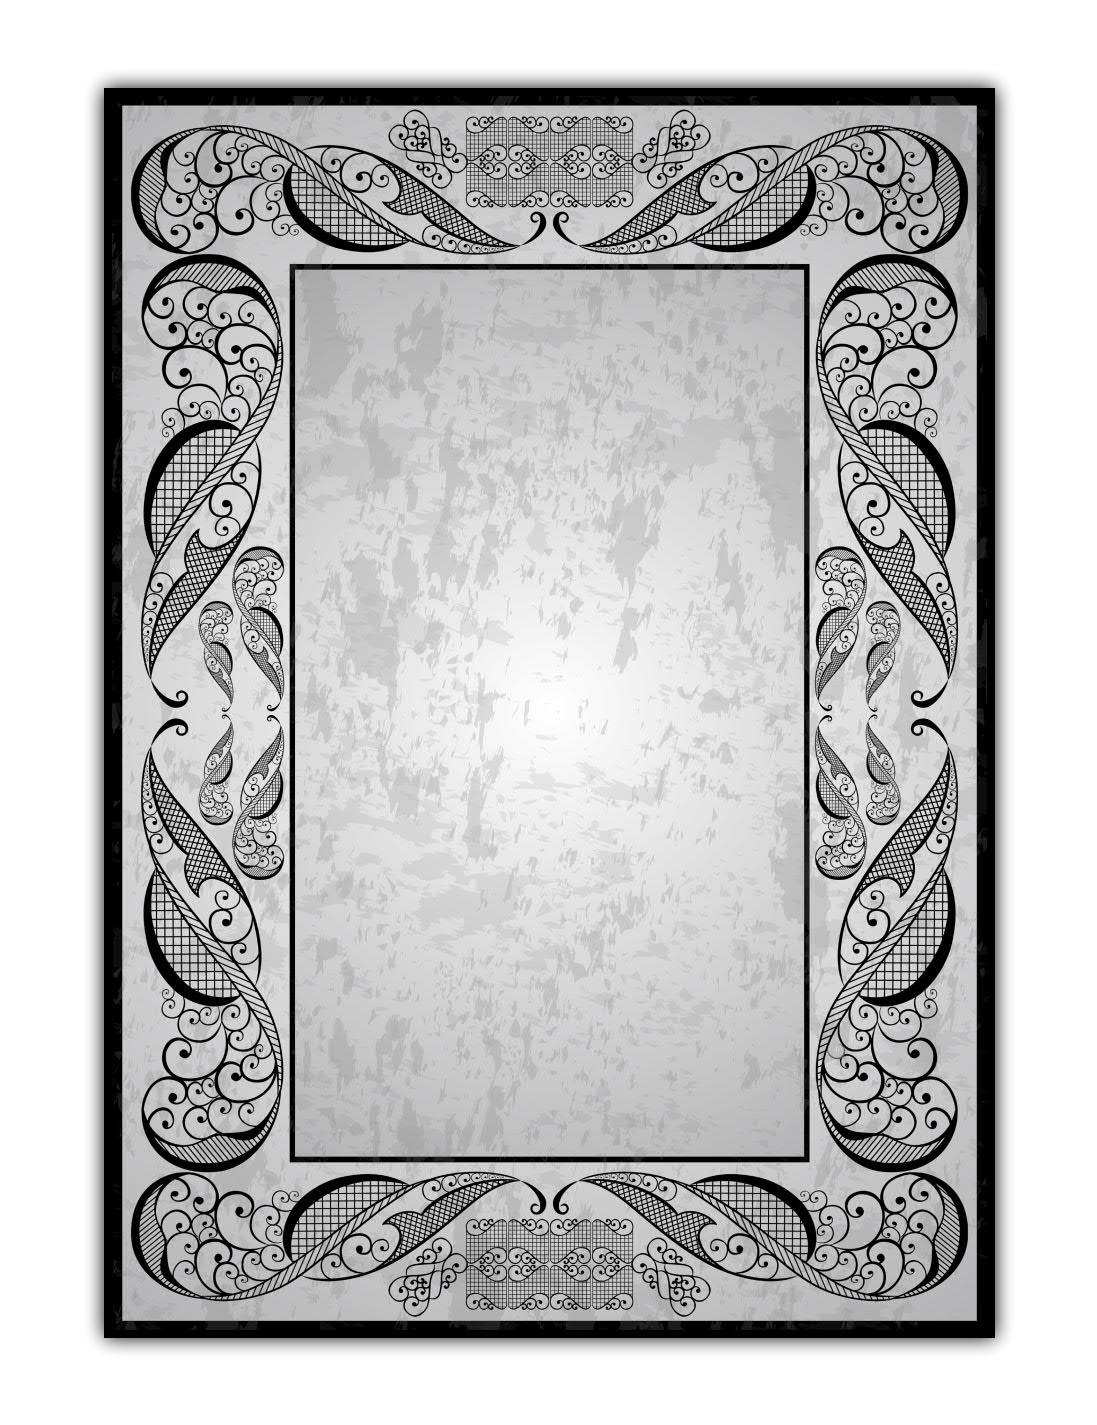 Vintage Muster Motiv Briefpapier (MPA-5203, DIN A4, 100 Blatt) Motivpapier Ornamente schwarz weiss Retro